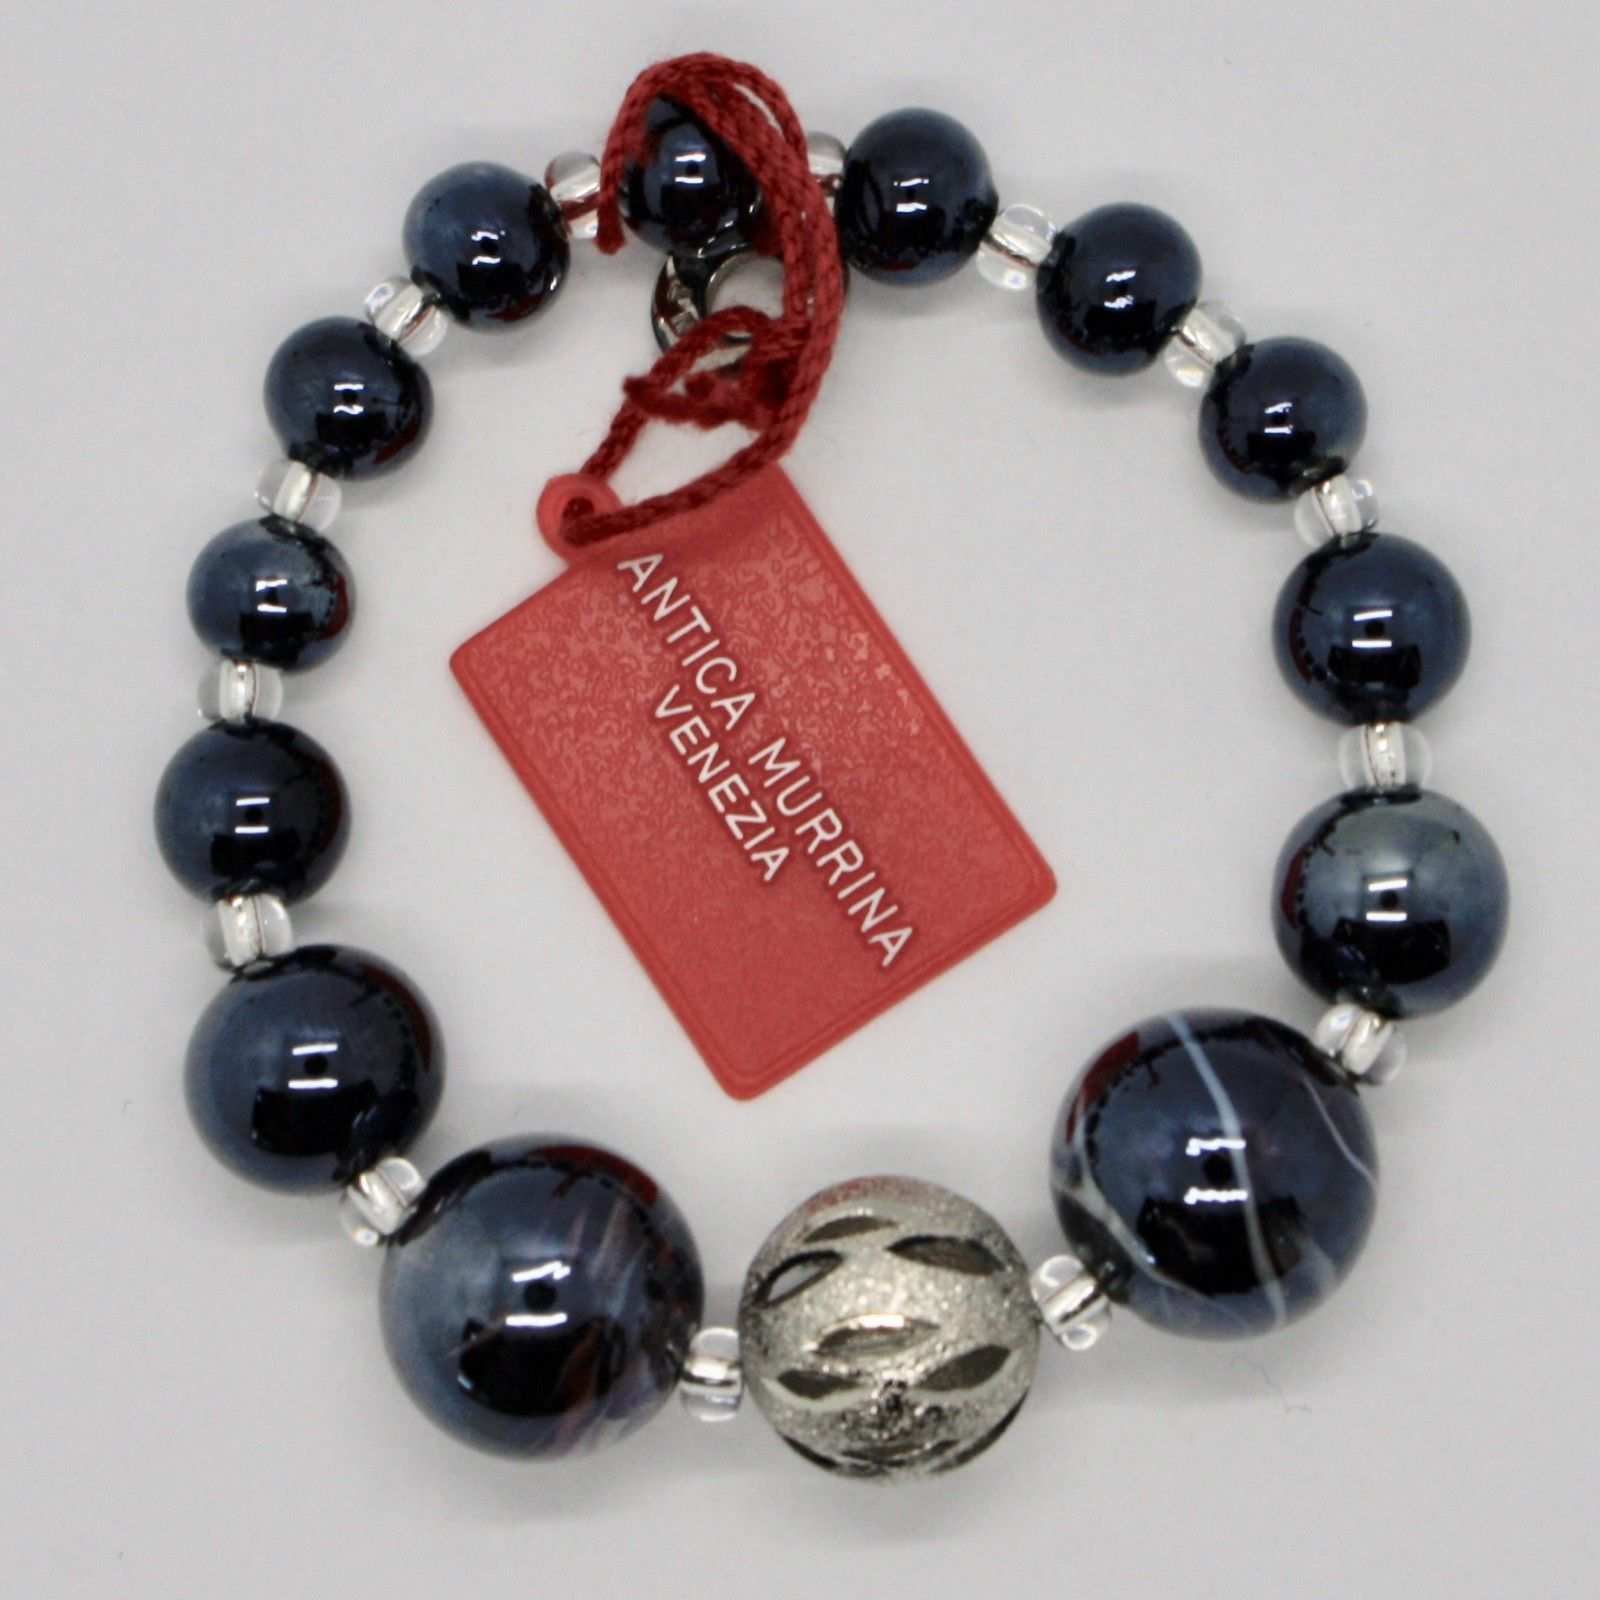 BRACELET ANTICA MURRINA VENEZIA WITH MURANO GLASS BLACK AND GRAY BR678A14